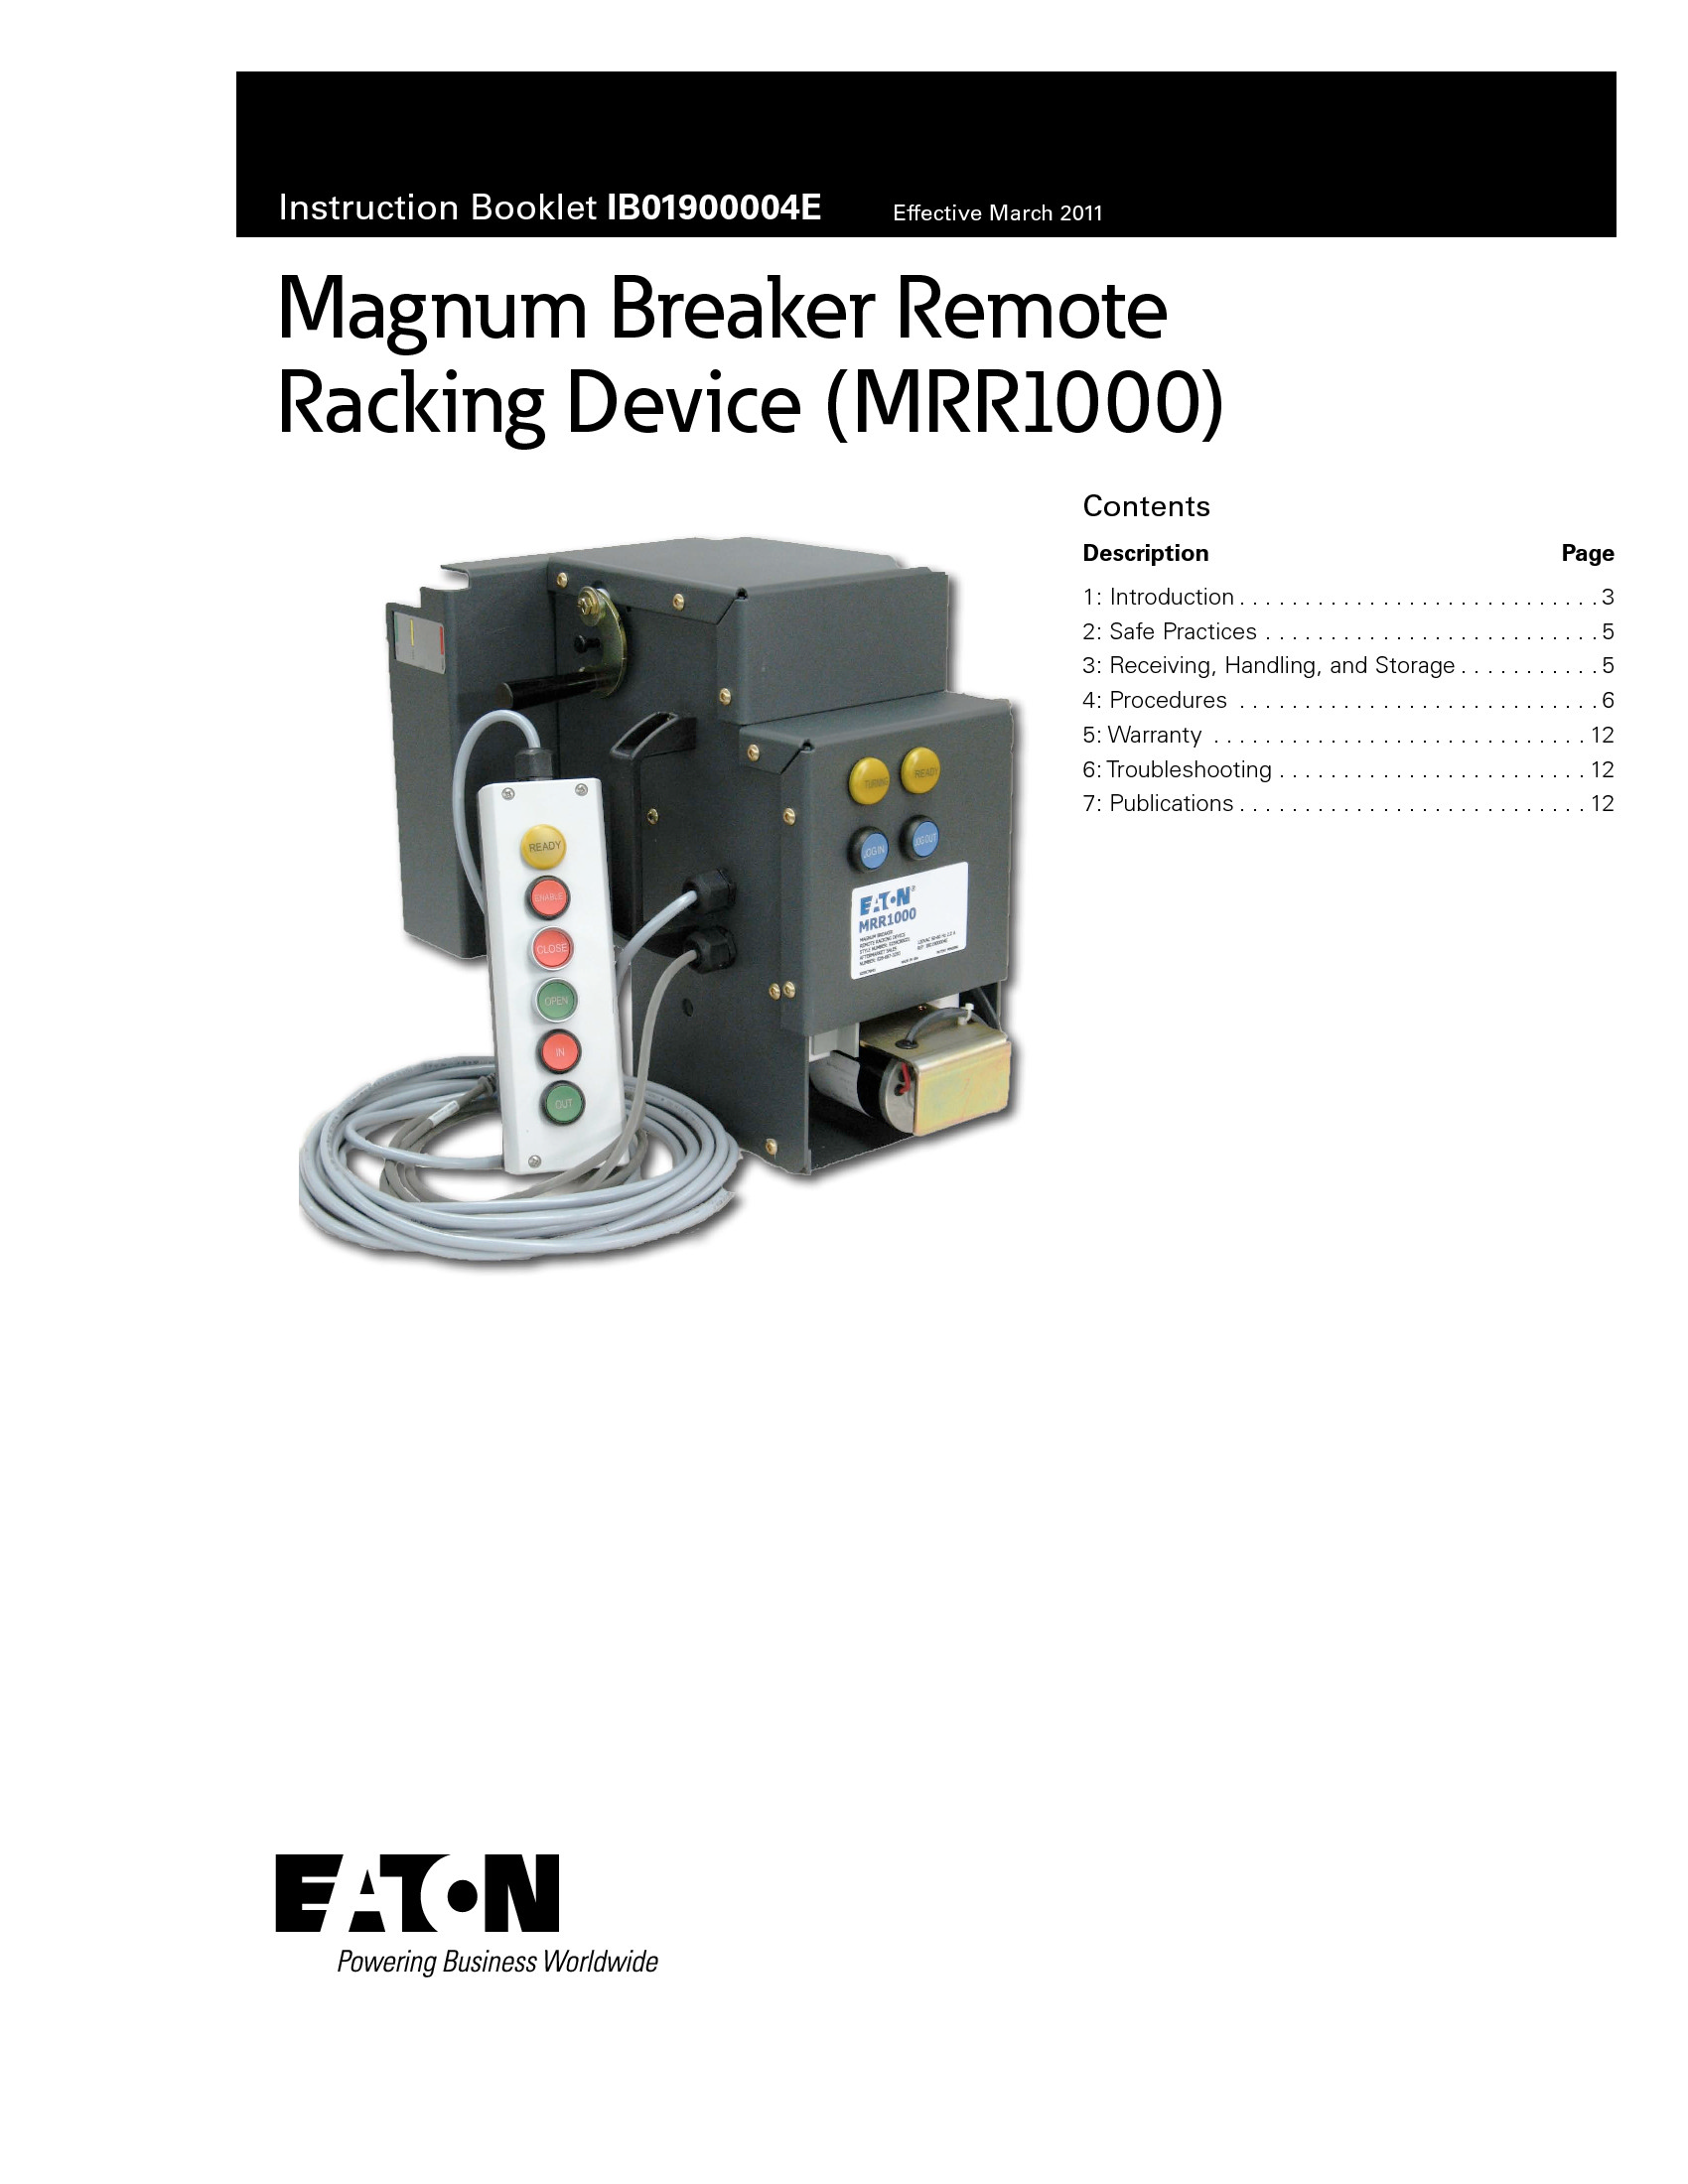 Savona Equipment Supplies Eaton Mrr1000 Remote Racking Device